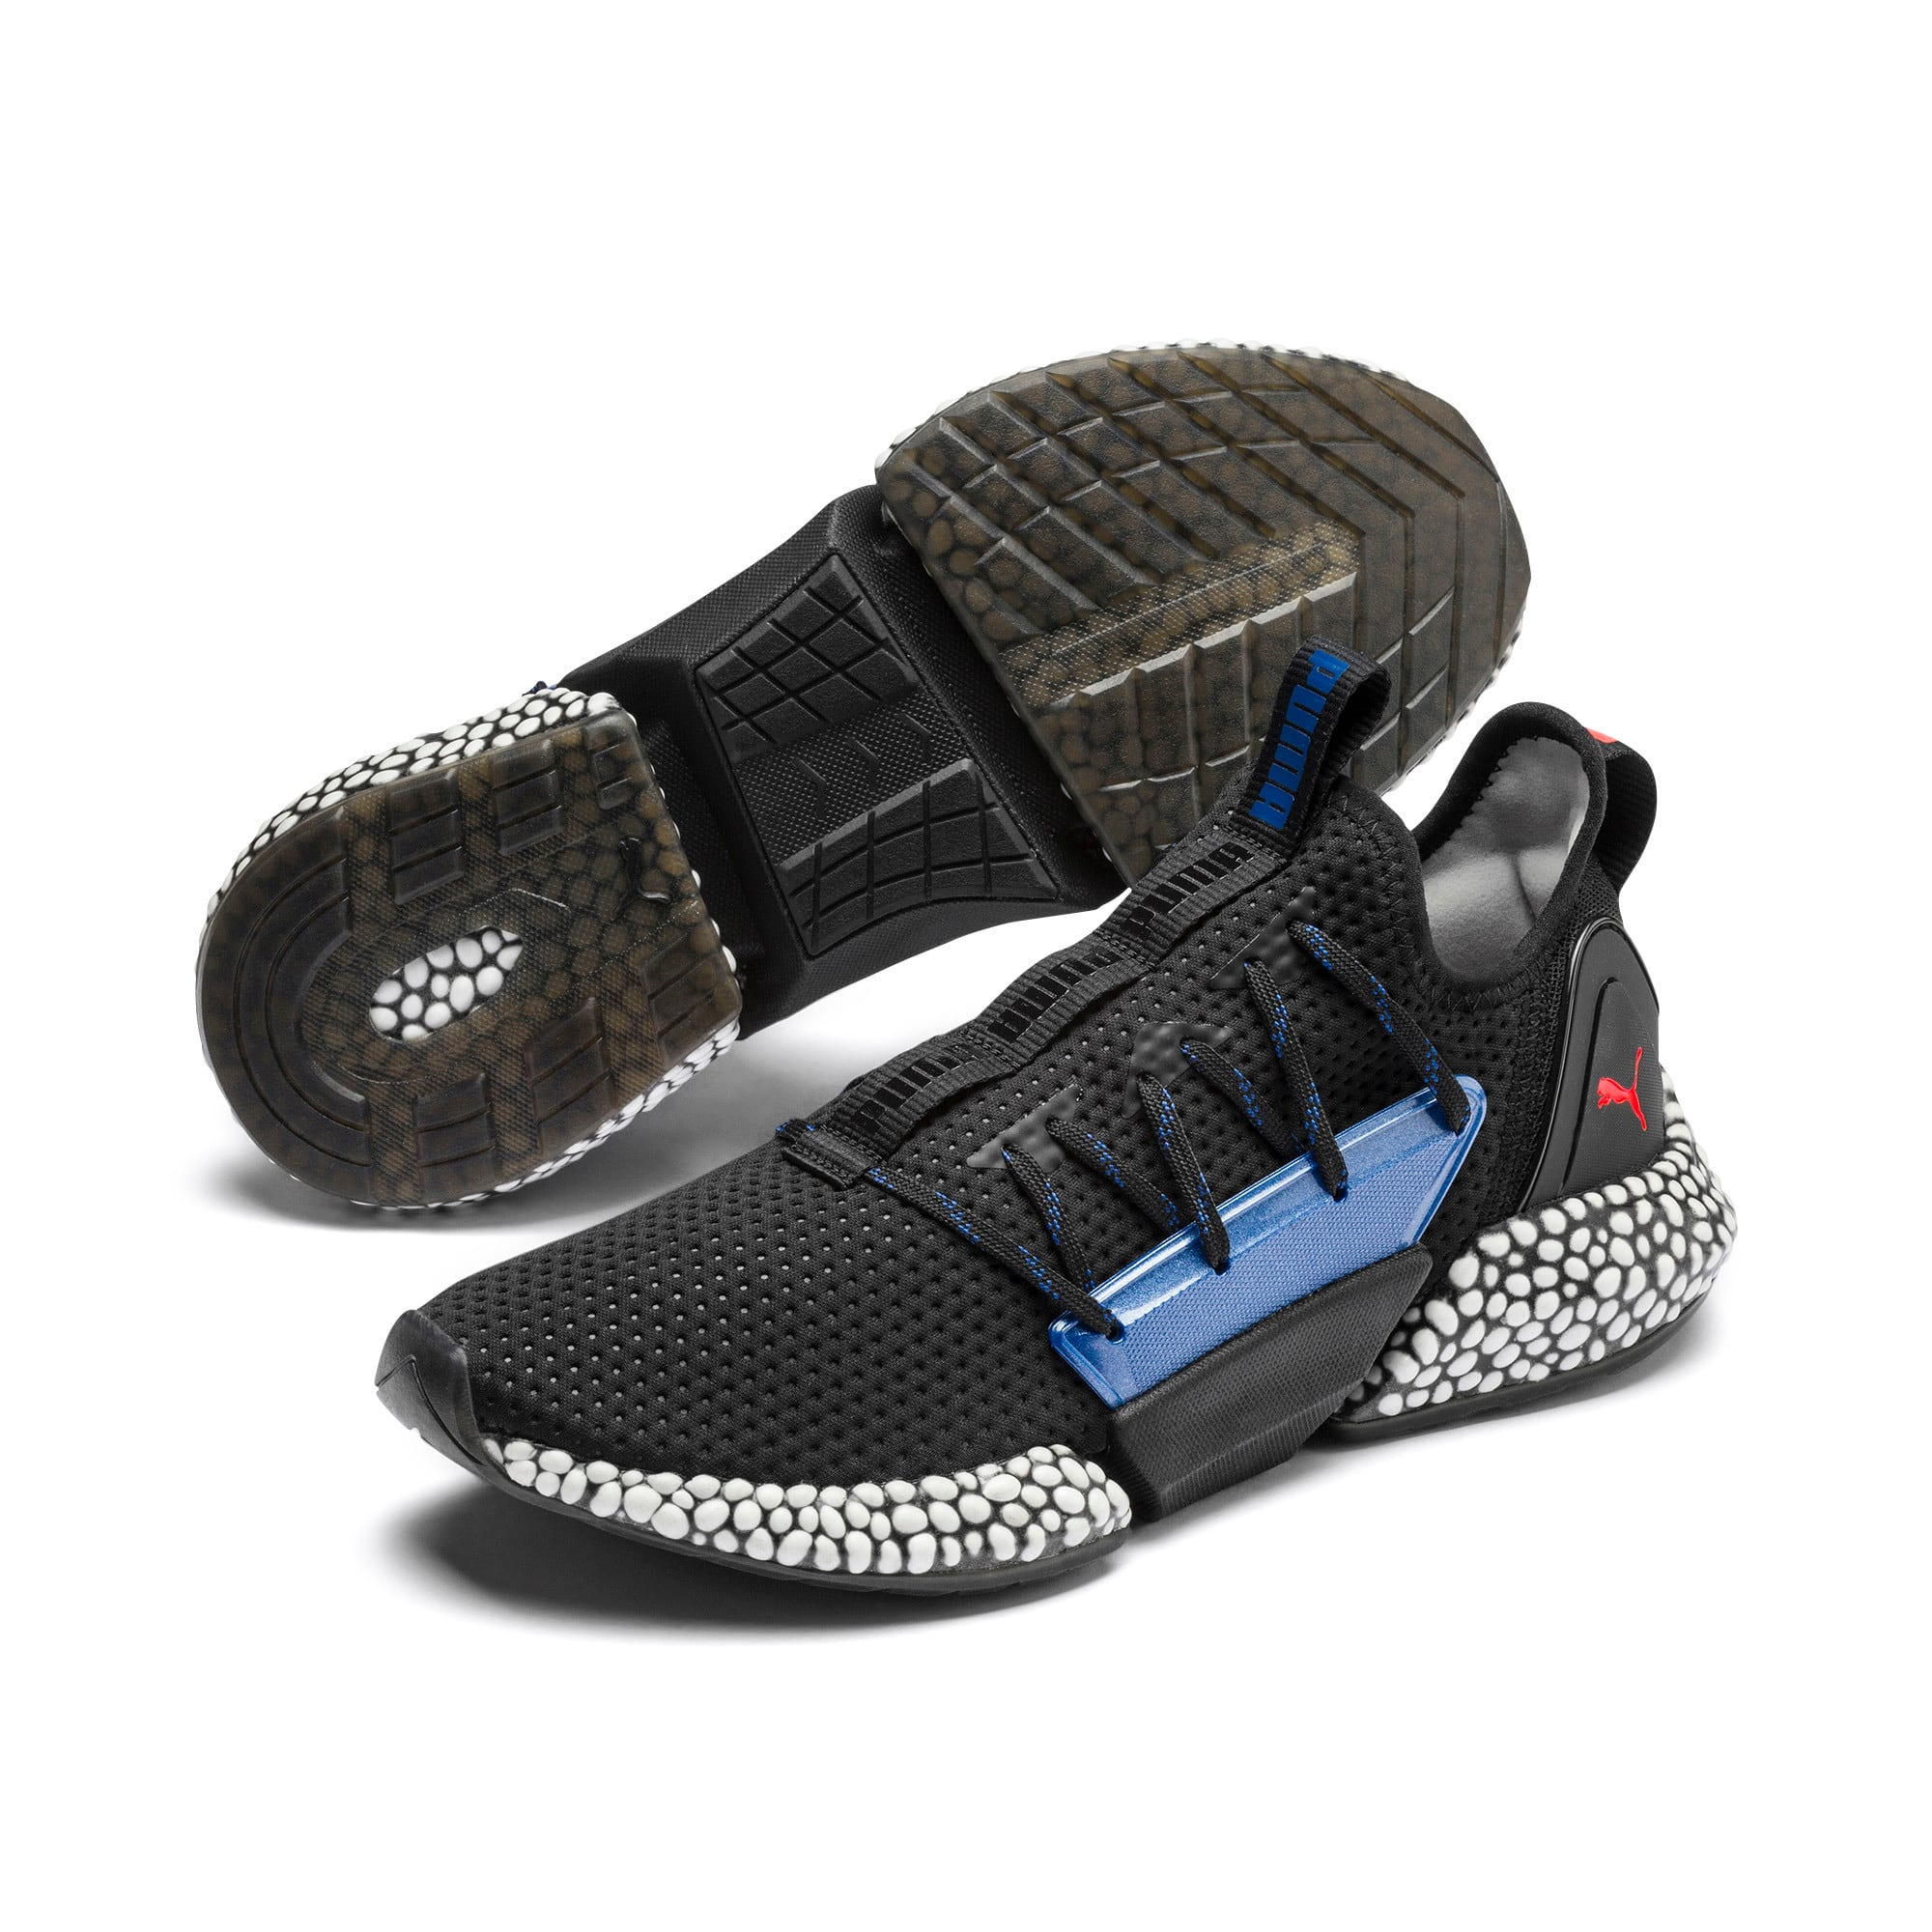 HYBRID Rocket Aero Men's Running Shoes